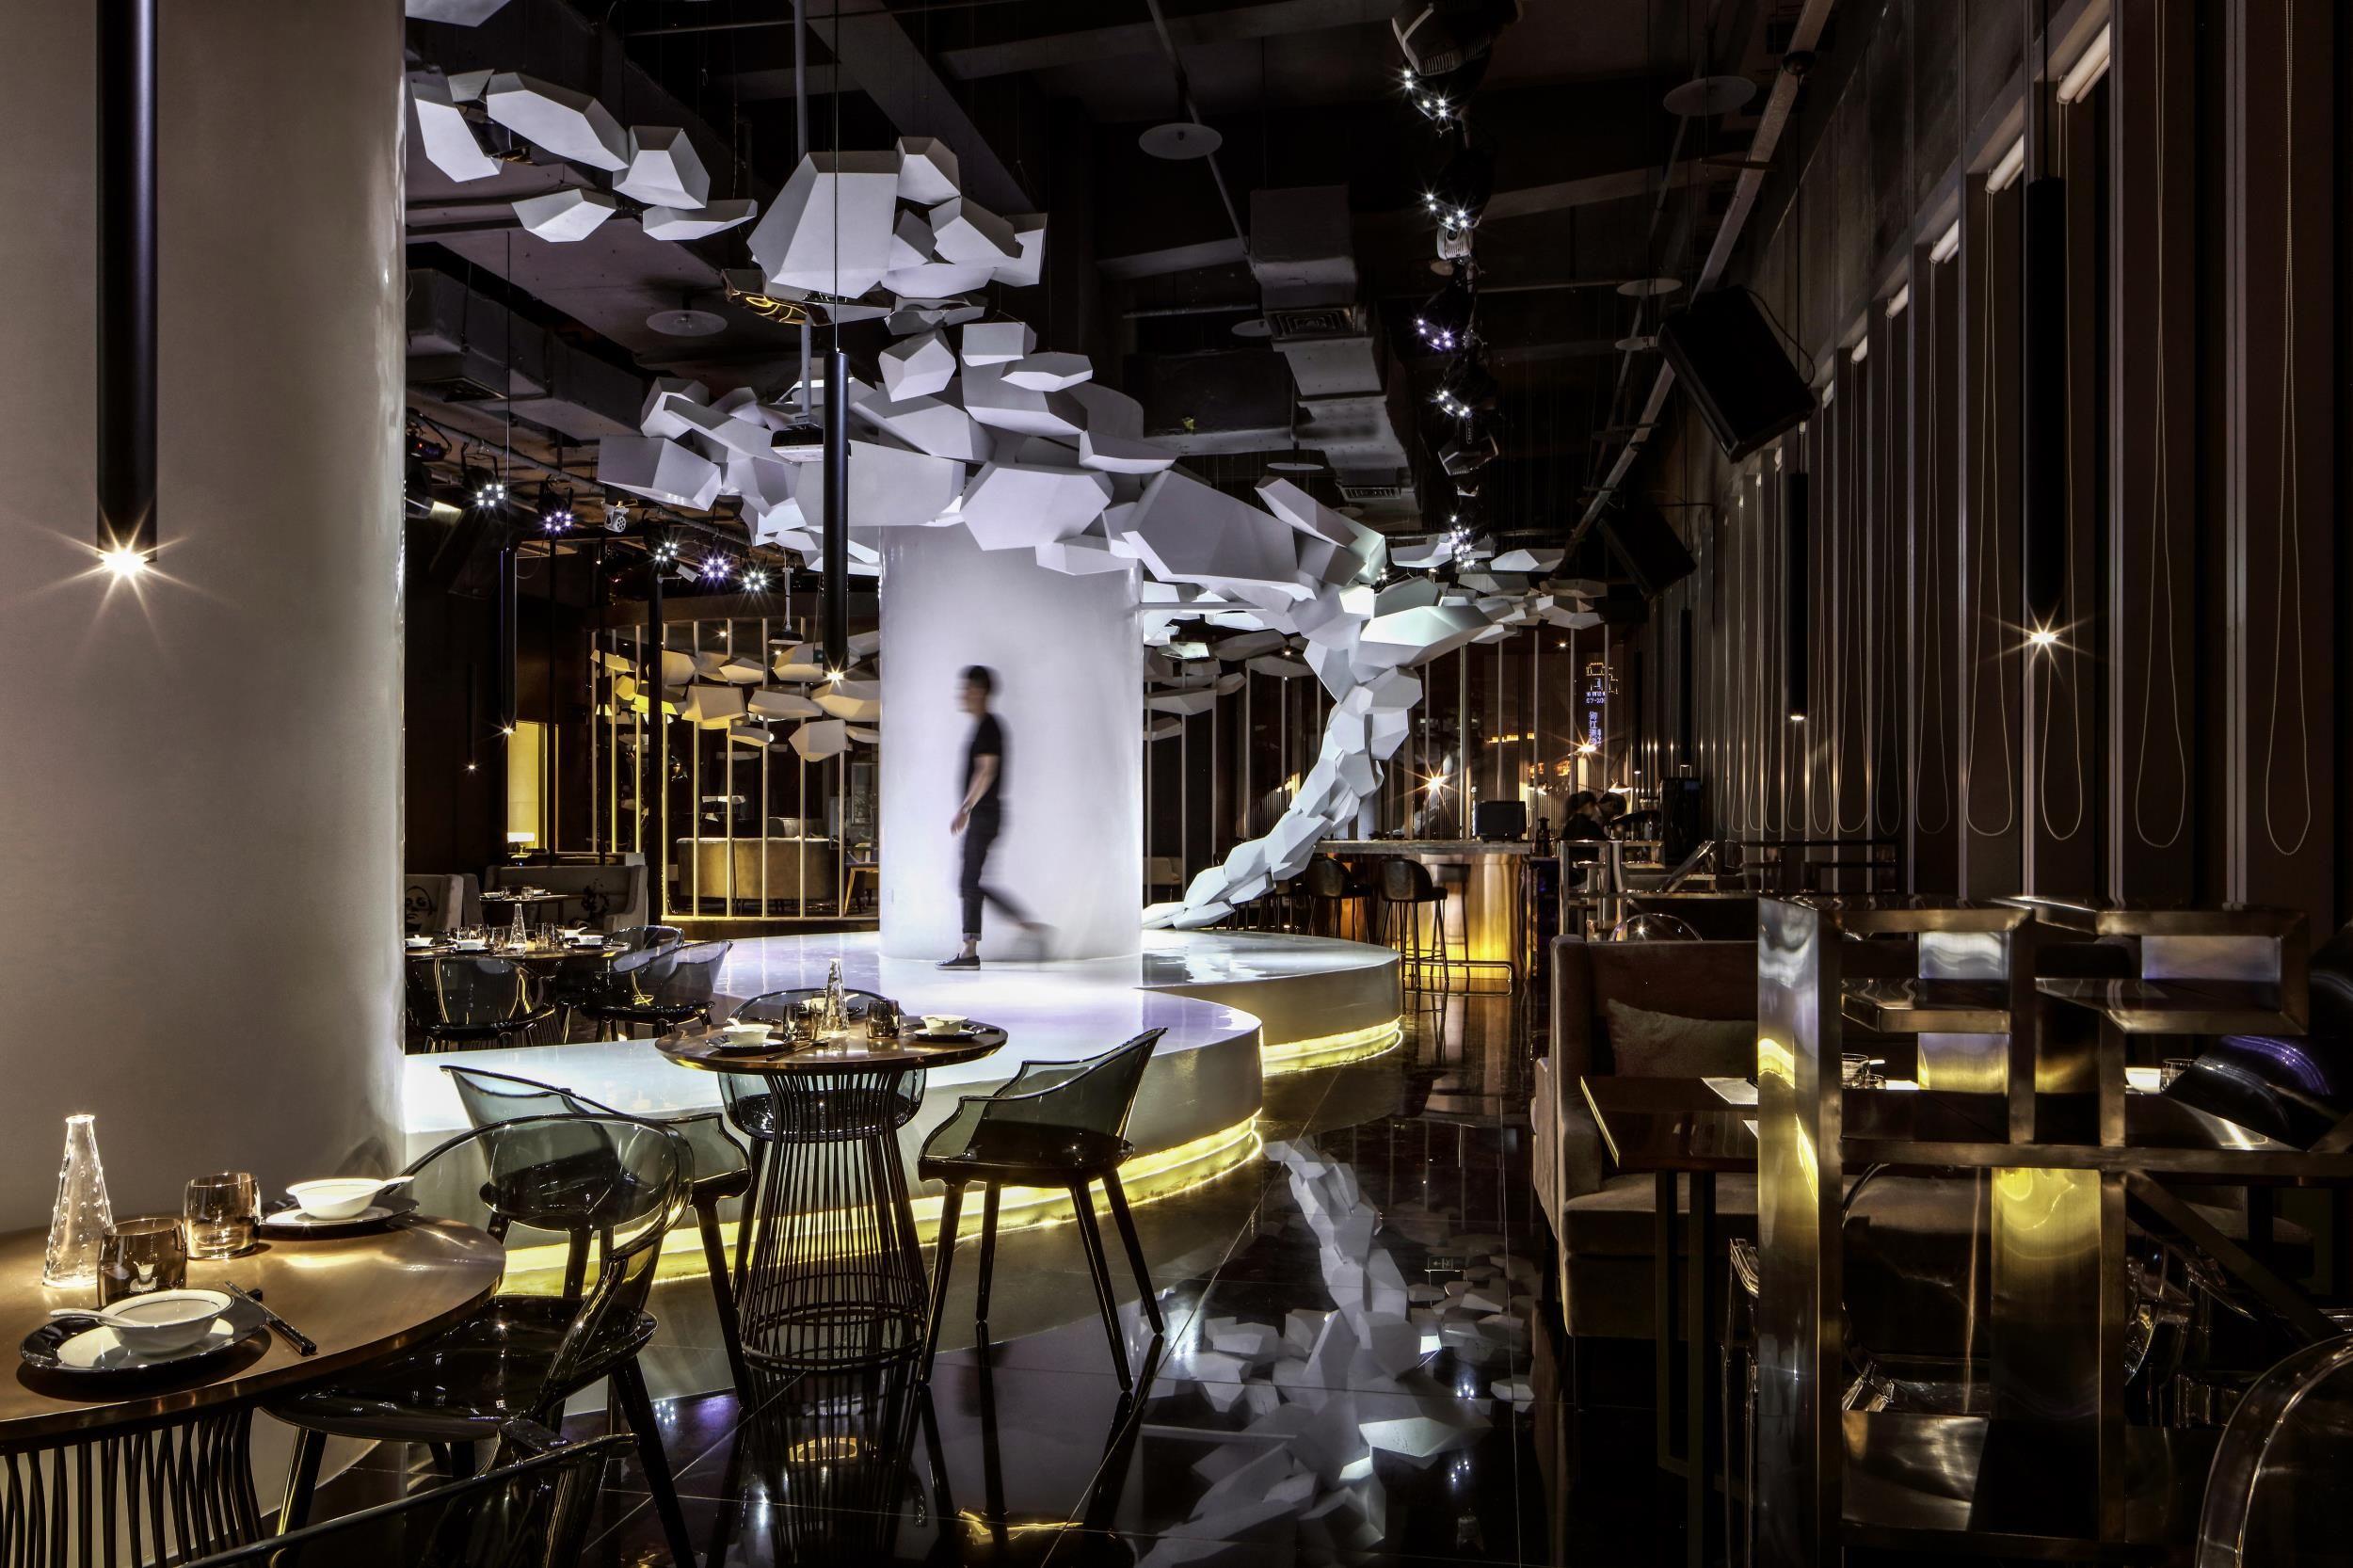 space元色餐厅 - 餐饮空间 - 刘攀设计作品案例